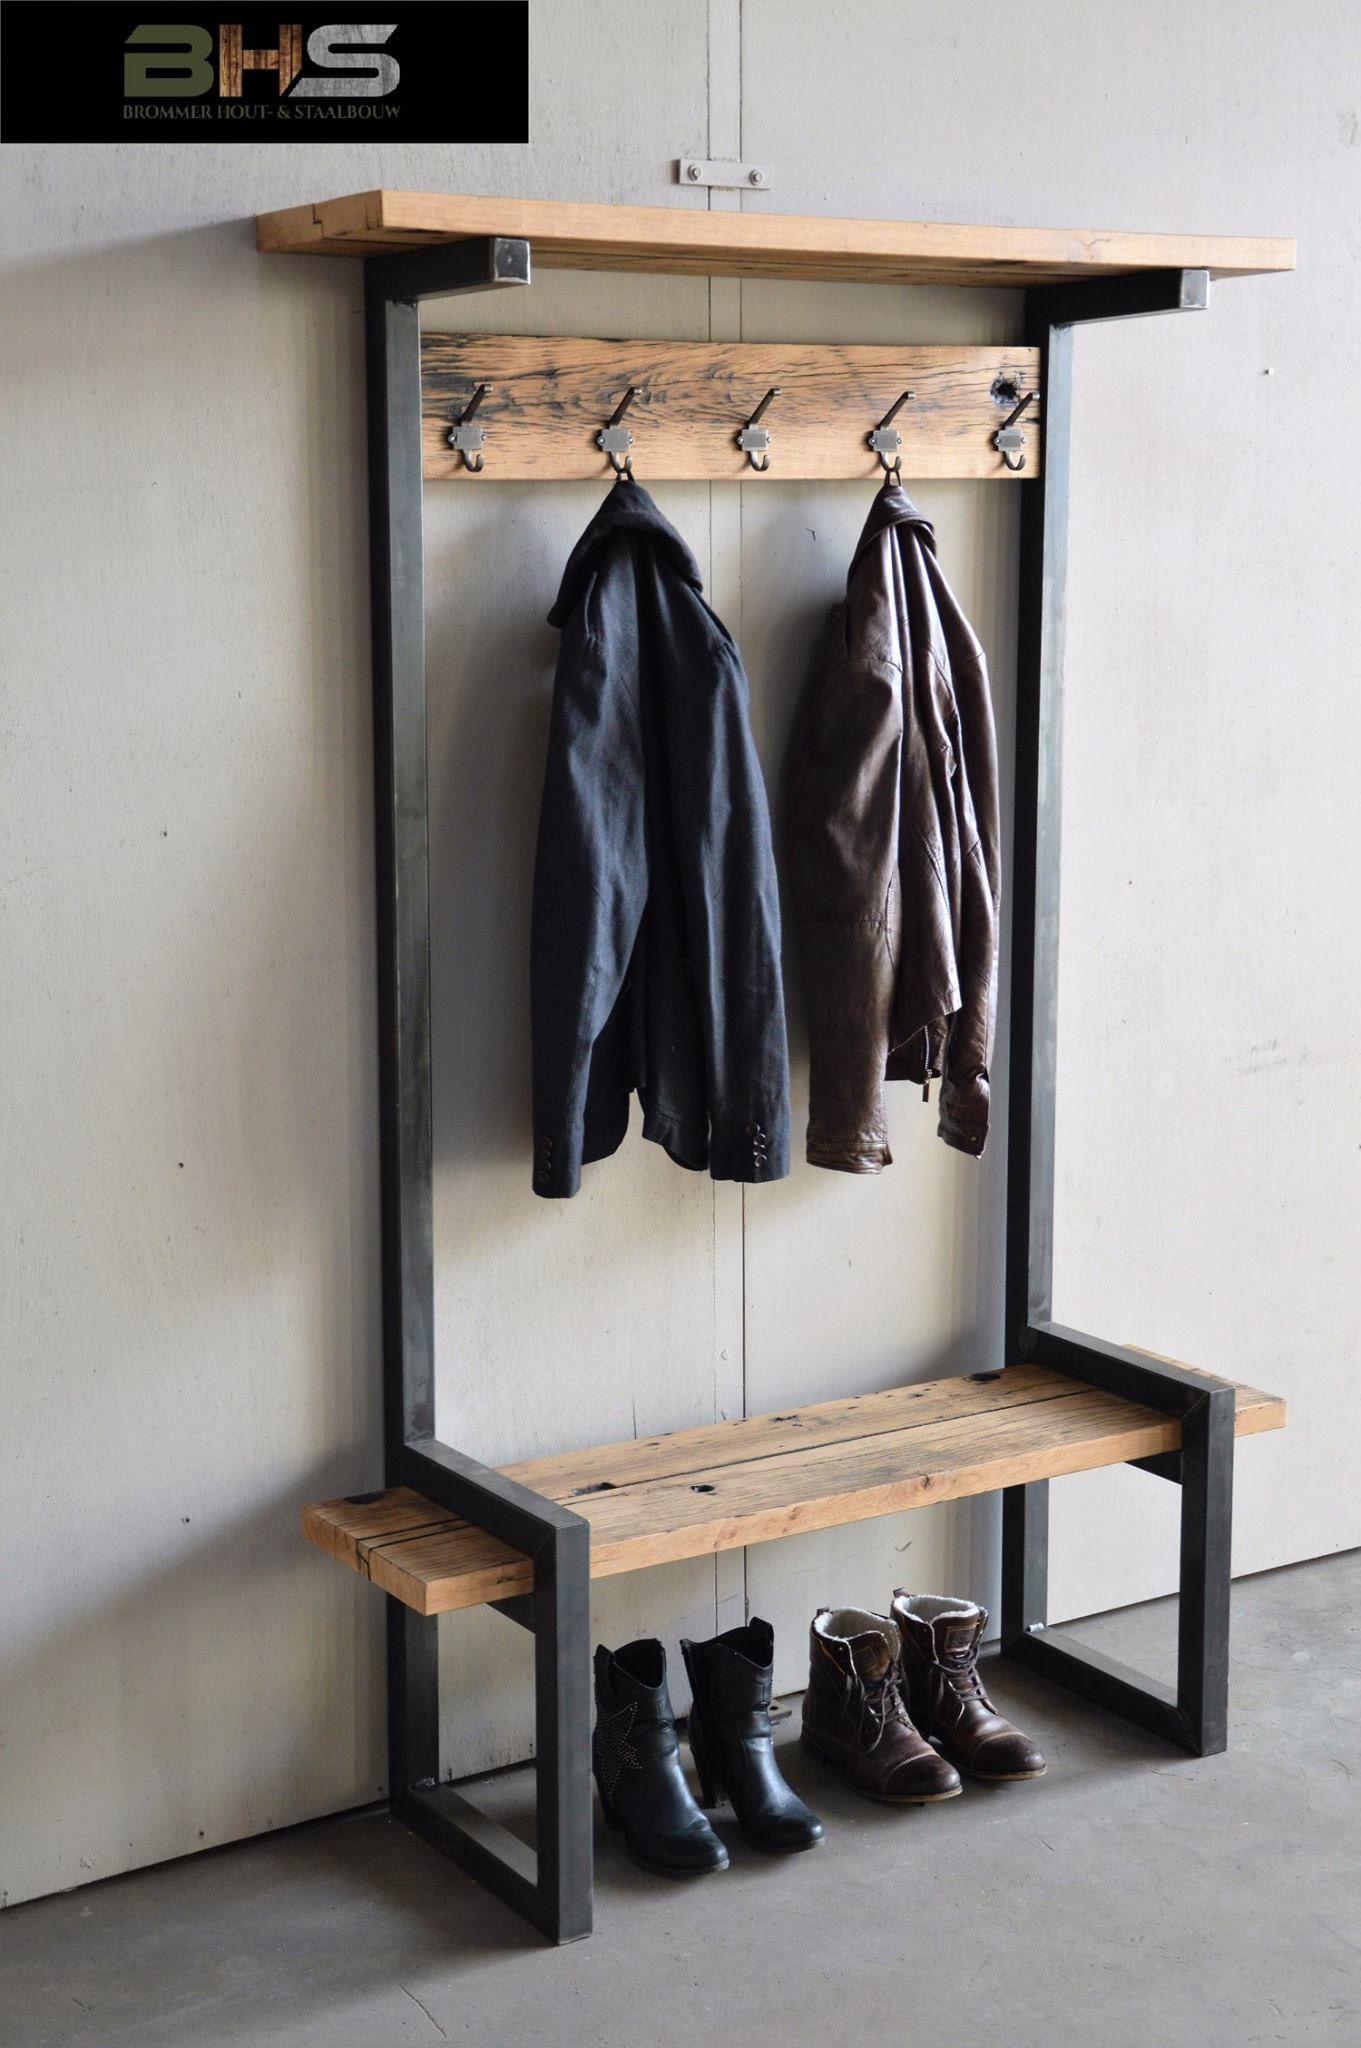 Метал меблі | Home ideas | Pinterest | Madera, Hierro y Herrería